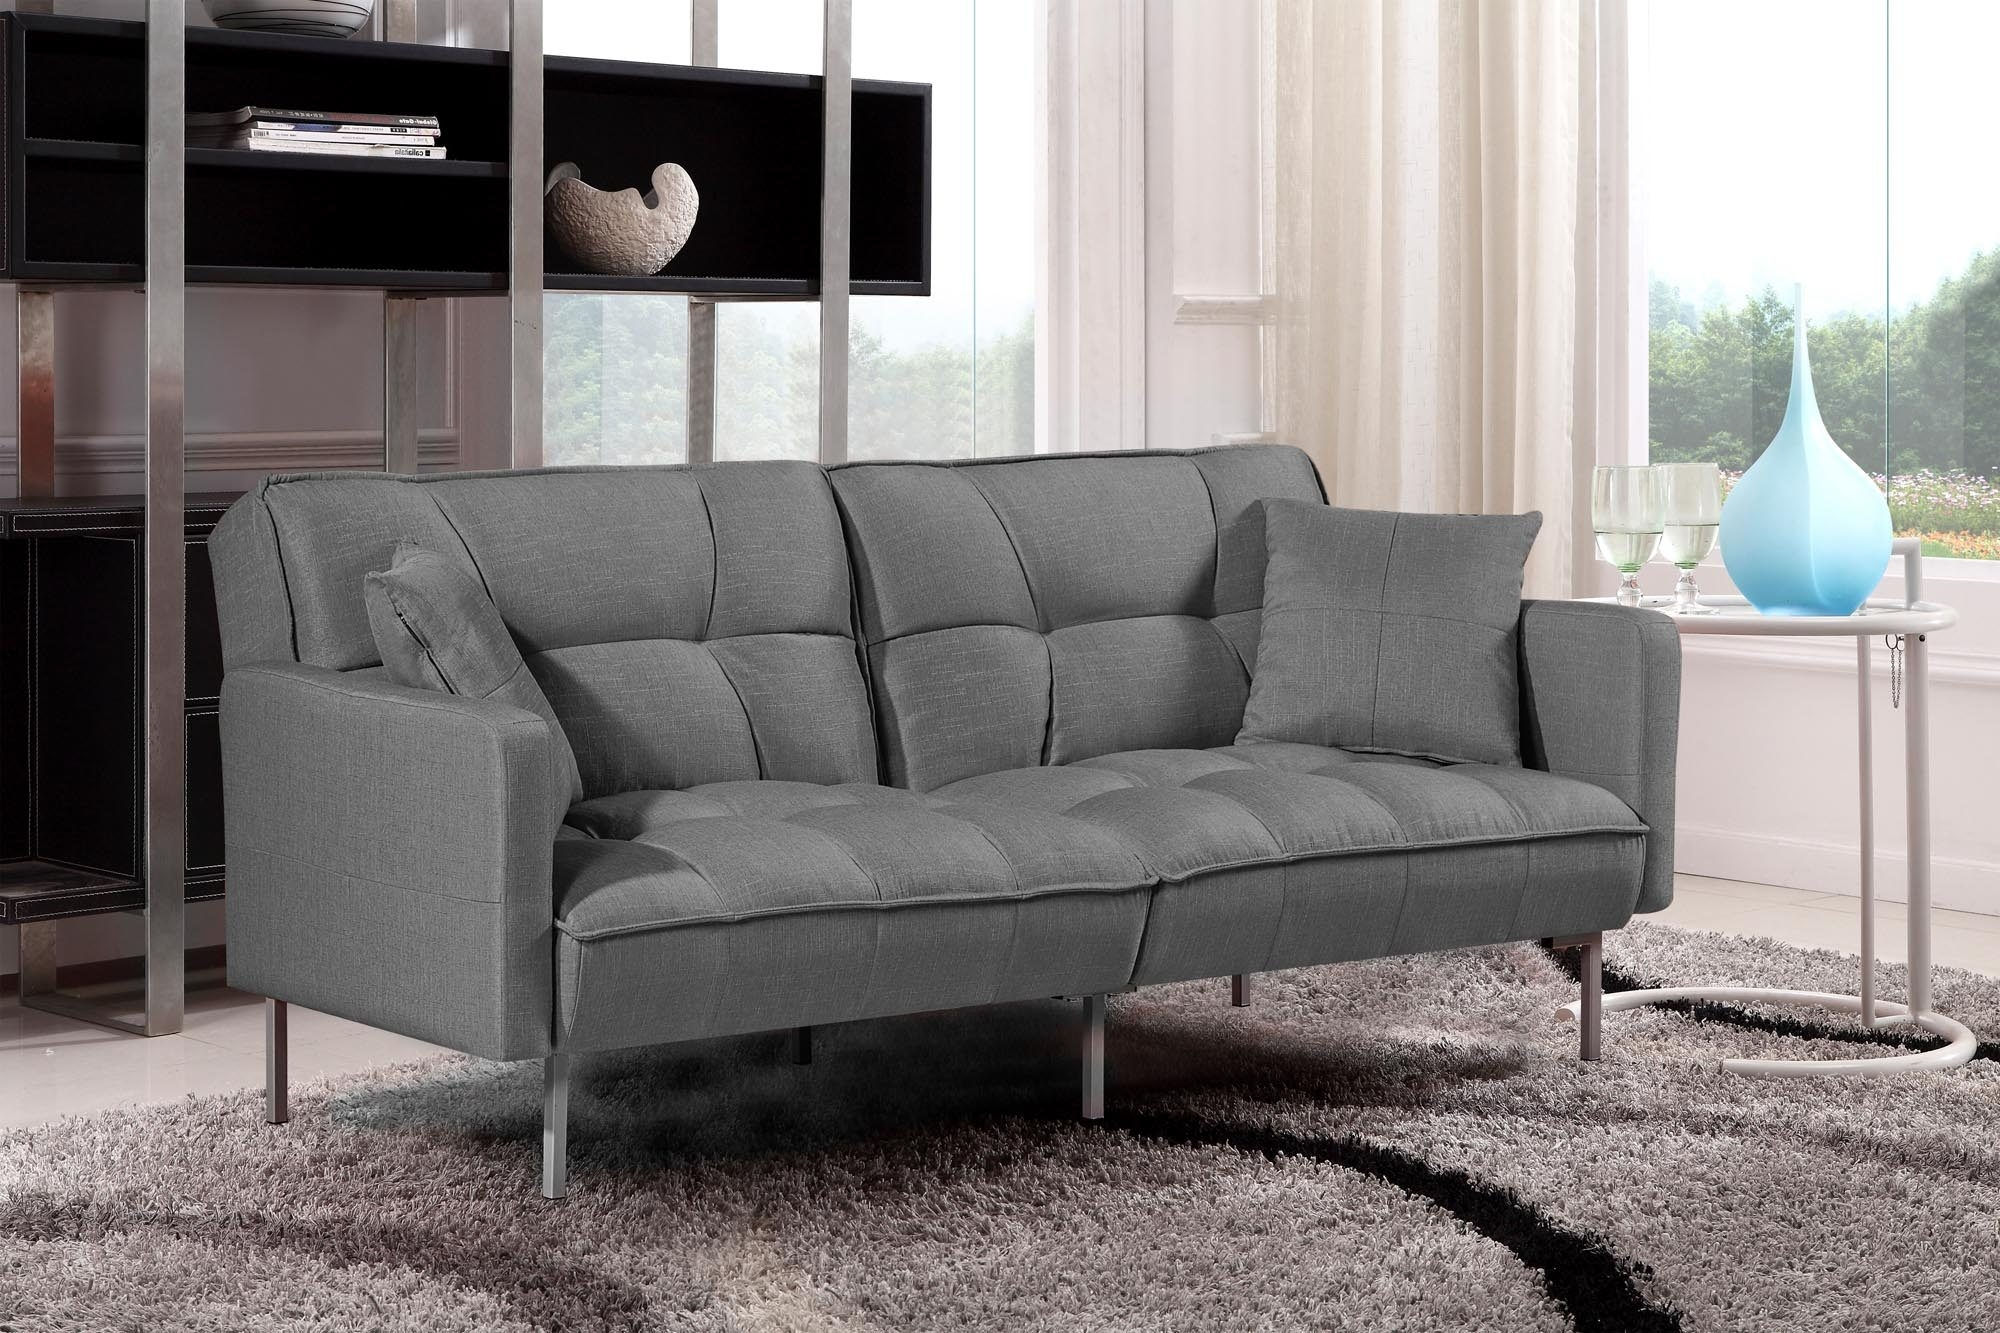 Canapea extensibila tapitata cu stofa, 3 locuri Roberto Gri inchis, l193xA85xH86 cm